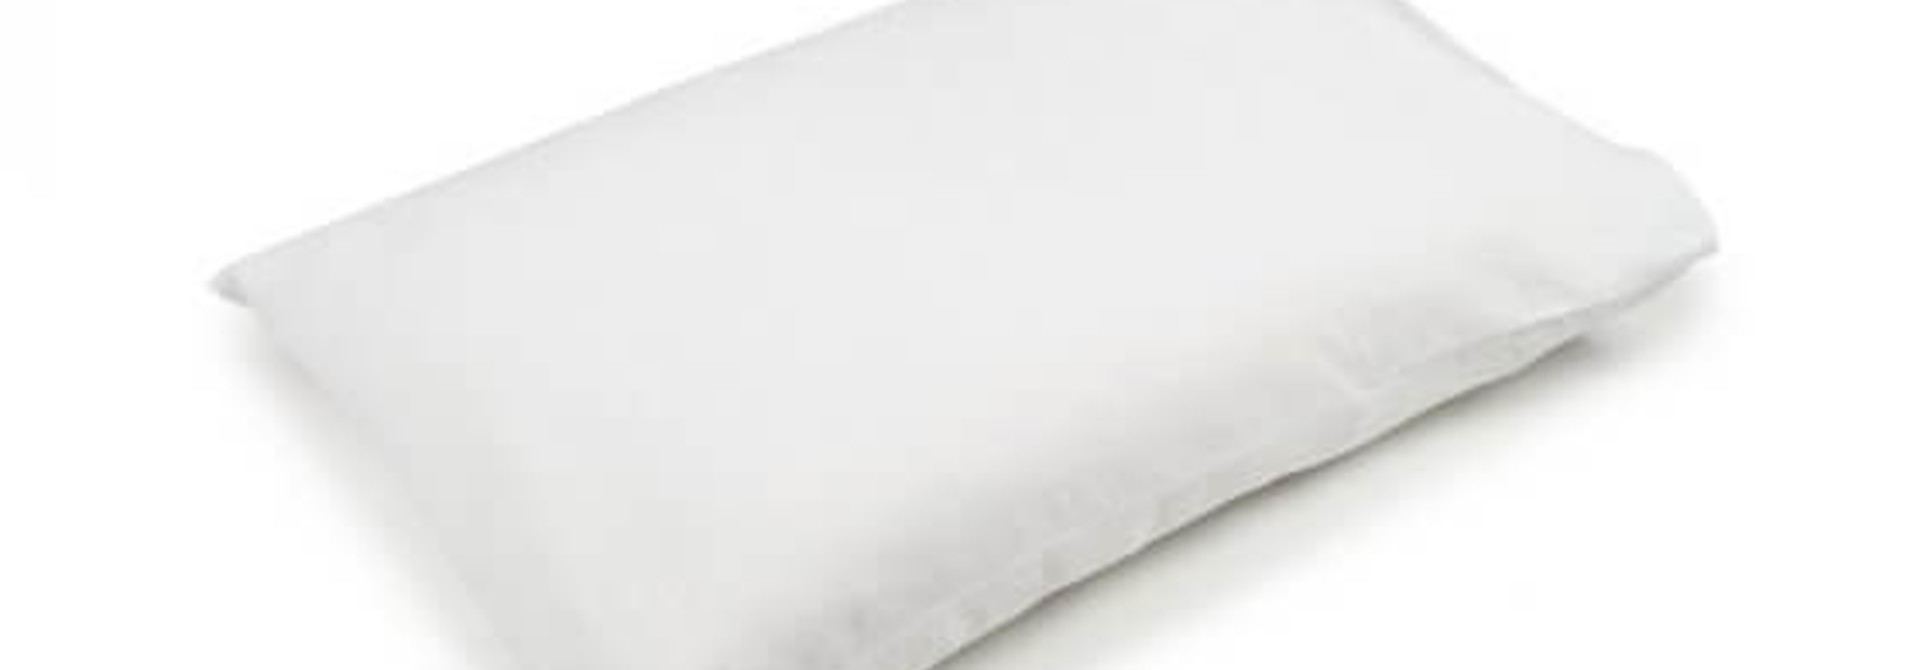 Pillow Sham - Madison - White - King